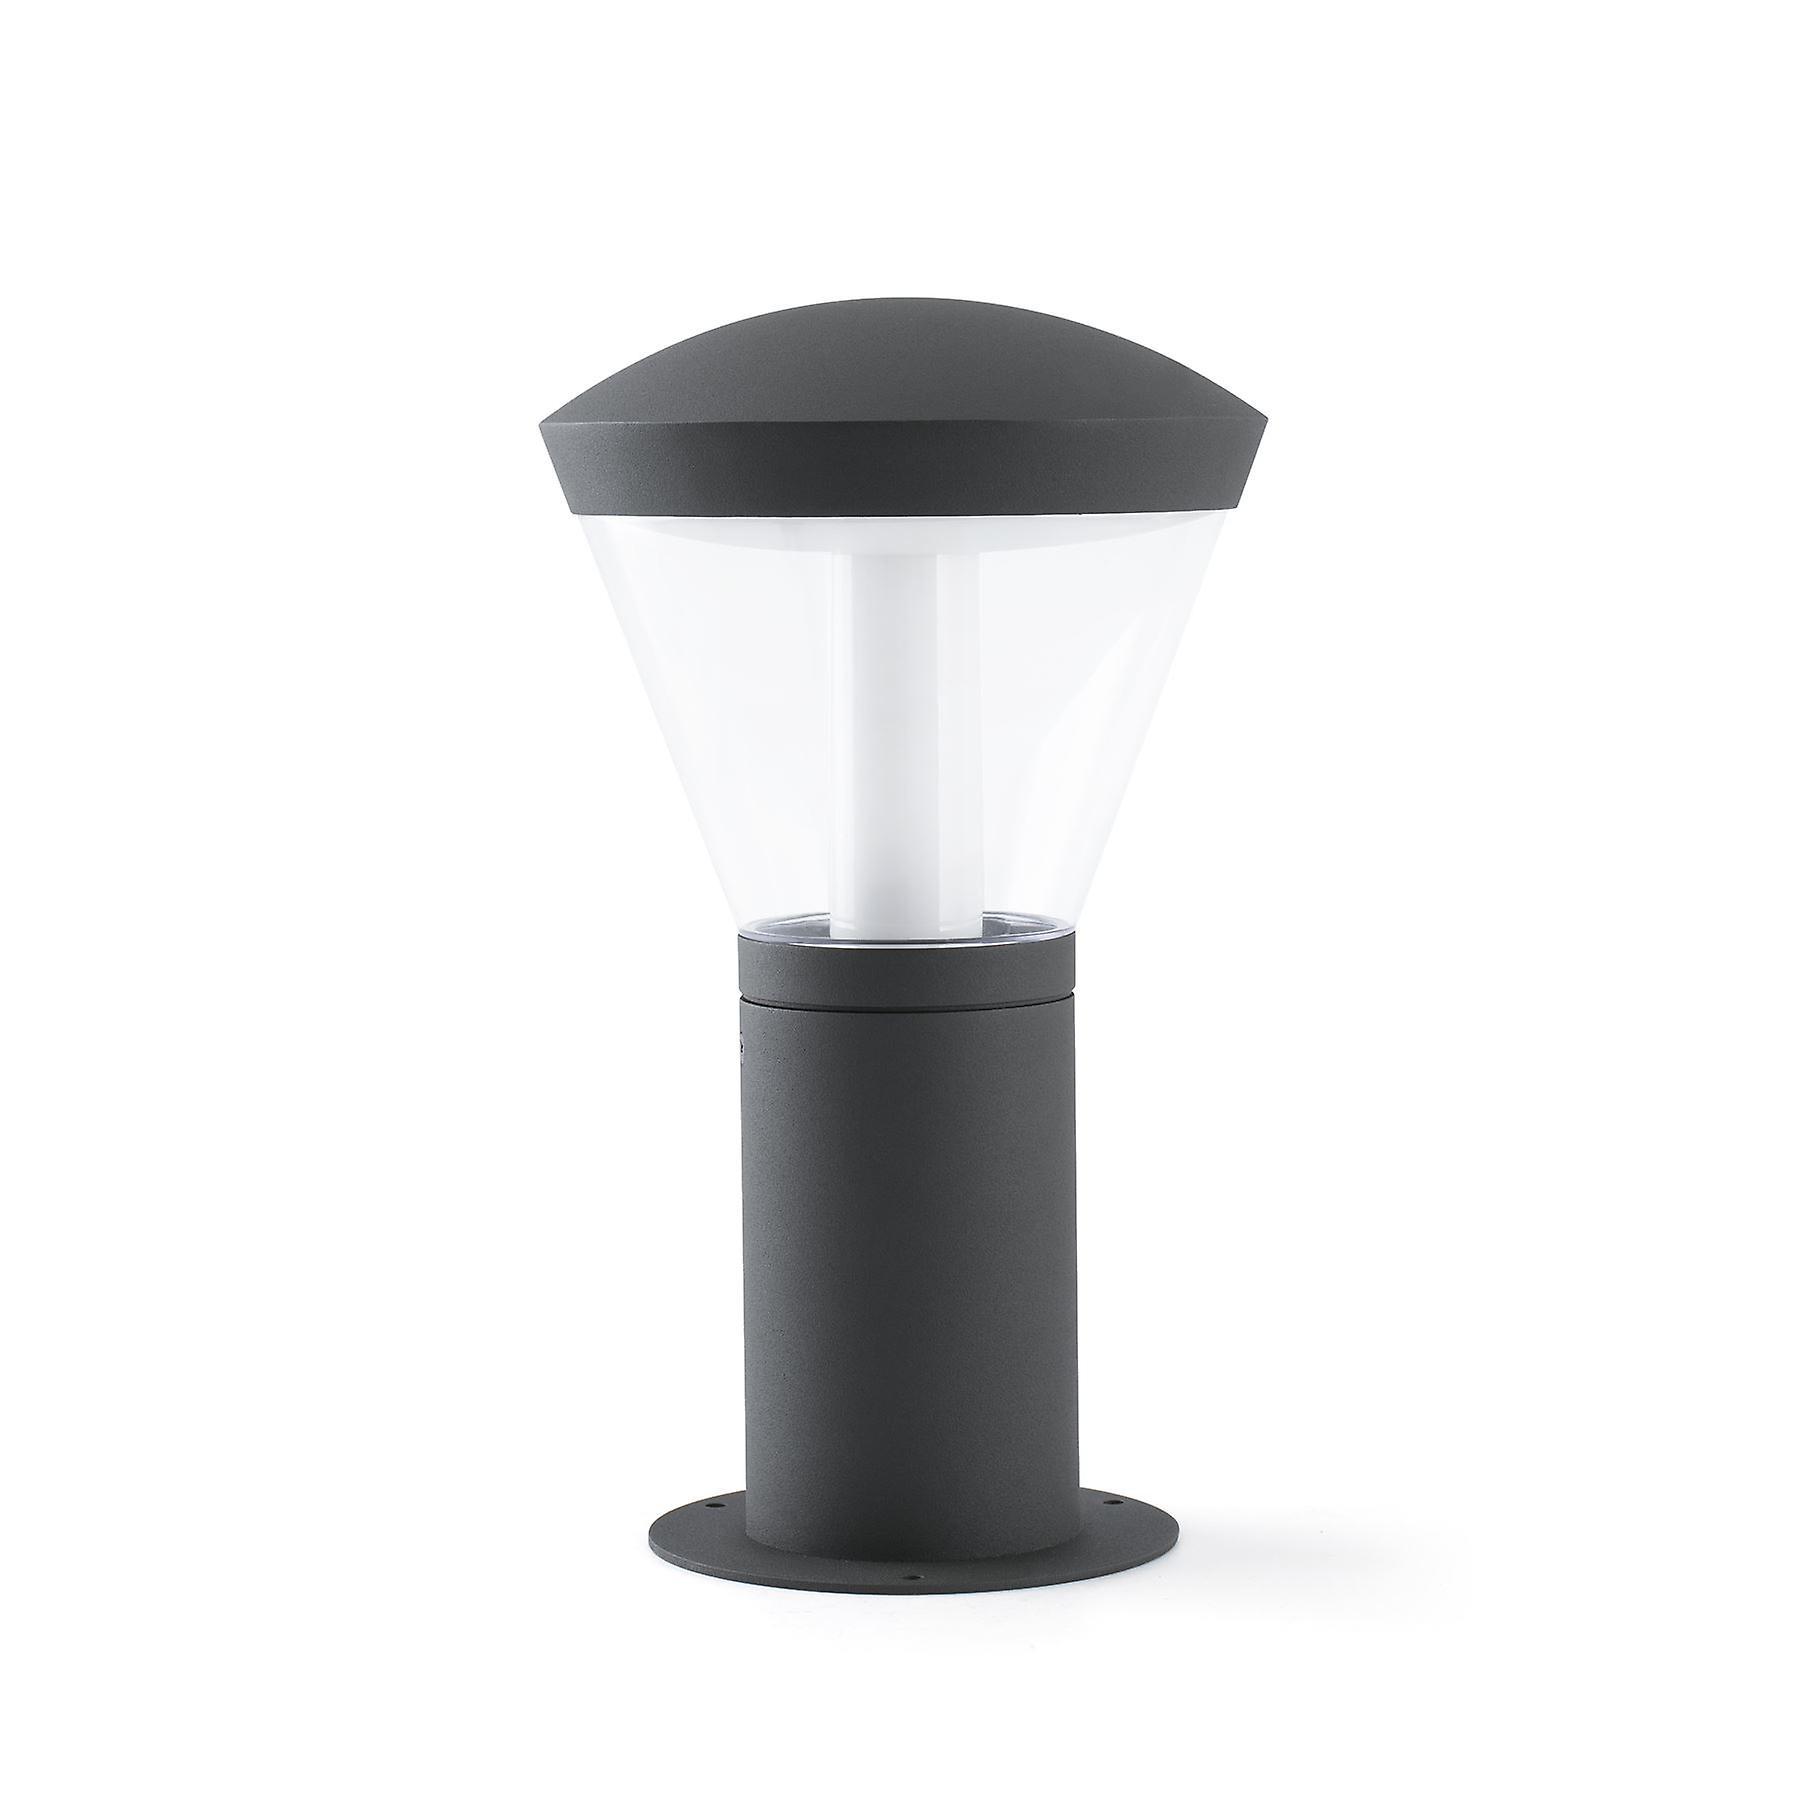 Faro - Shelby Dark gris LED de plein air Pedestal FARO75537